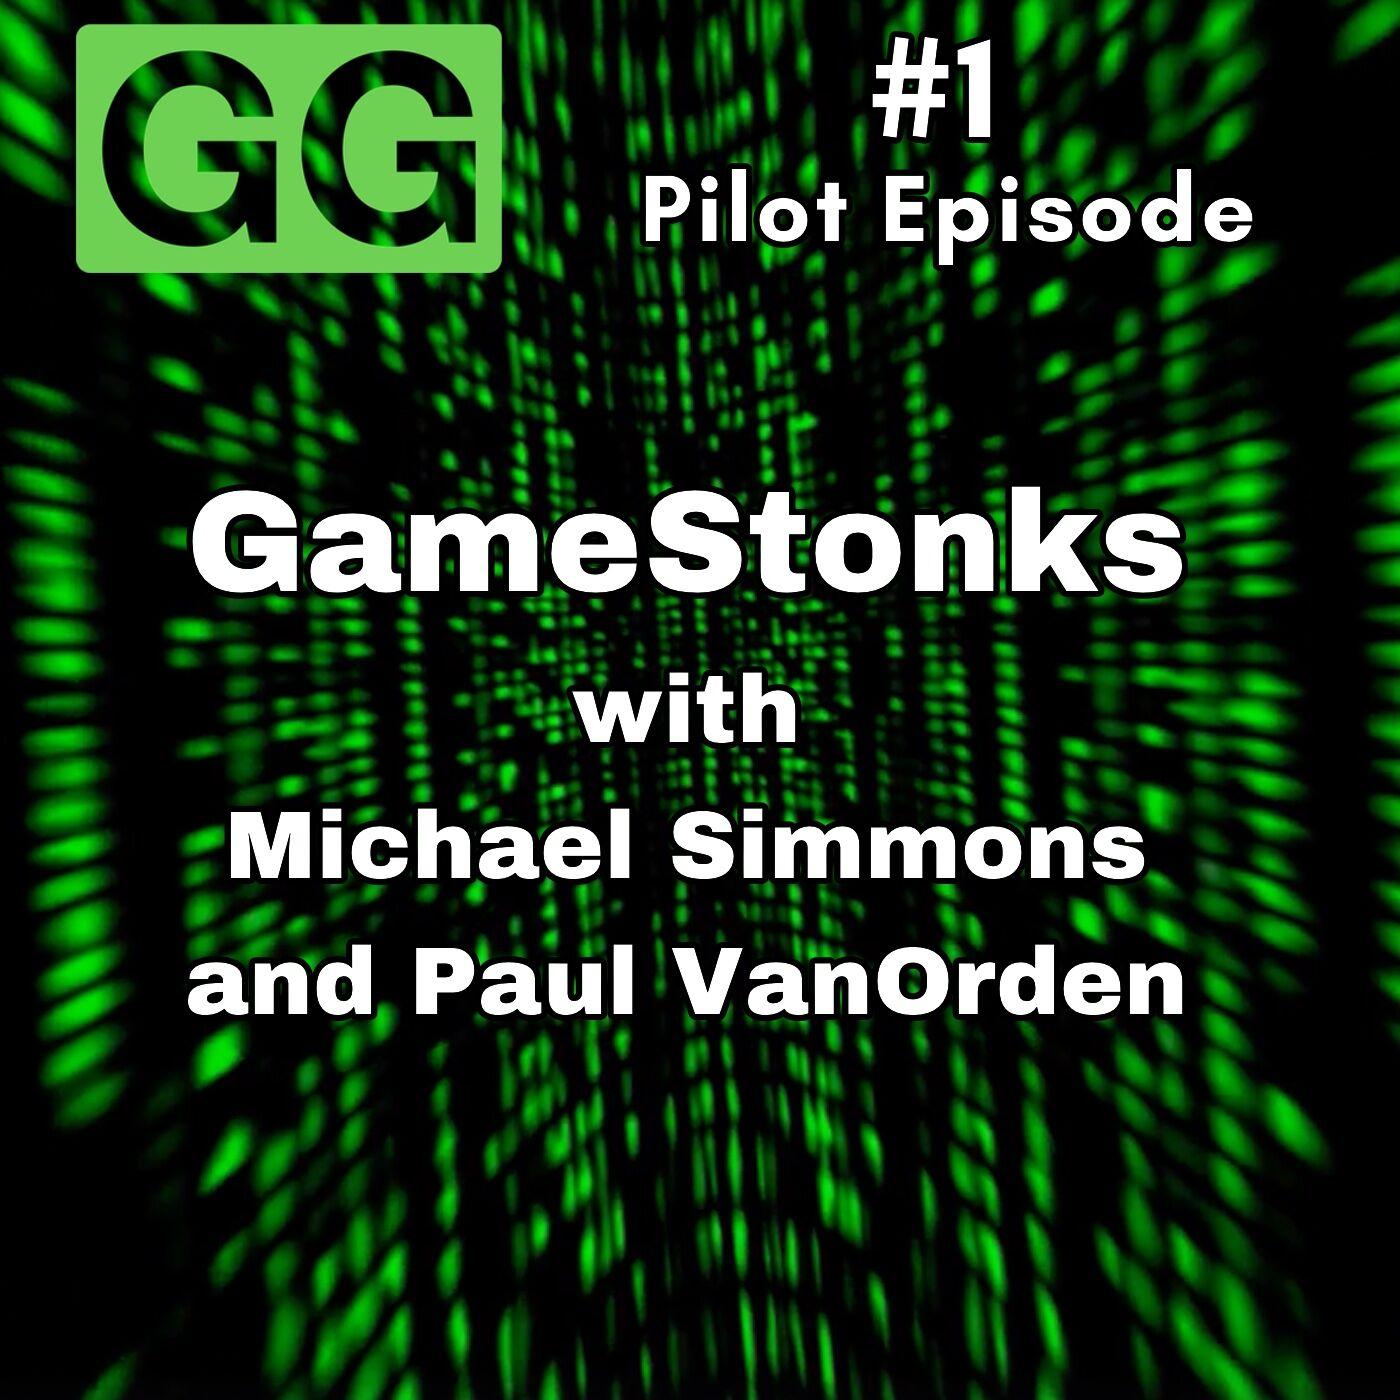 #1 - Pilot Episode: GameStonks